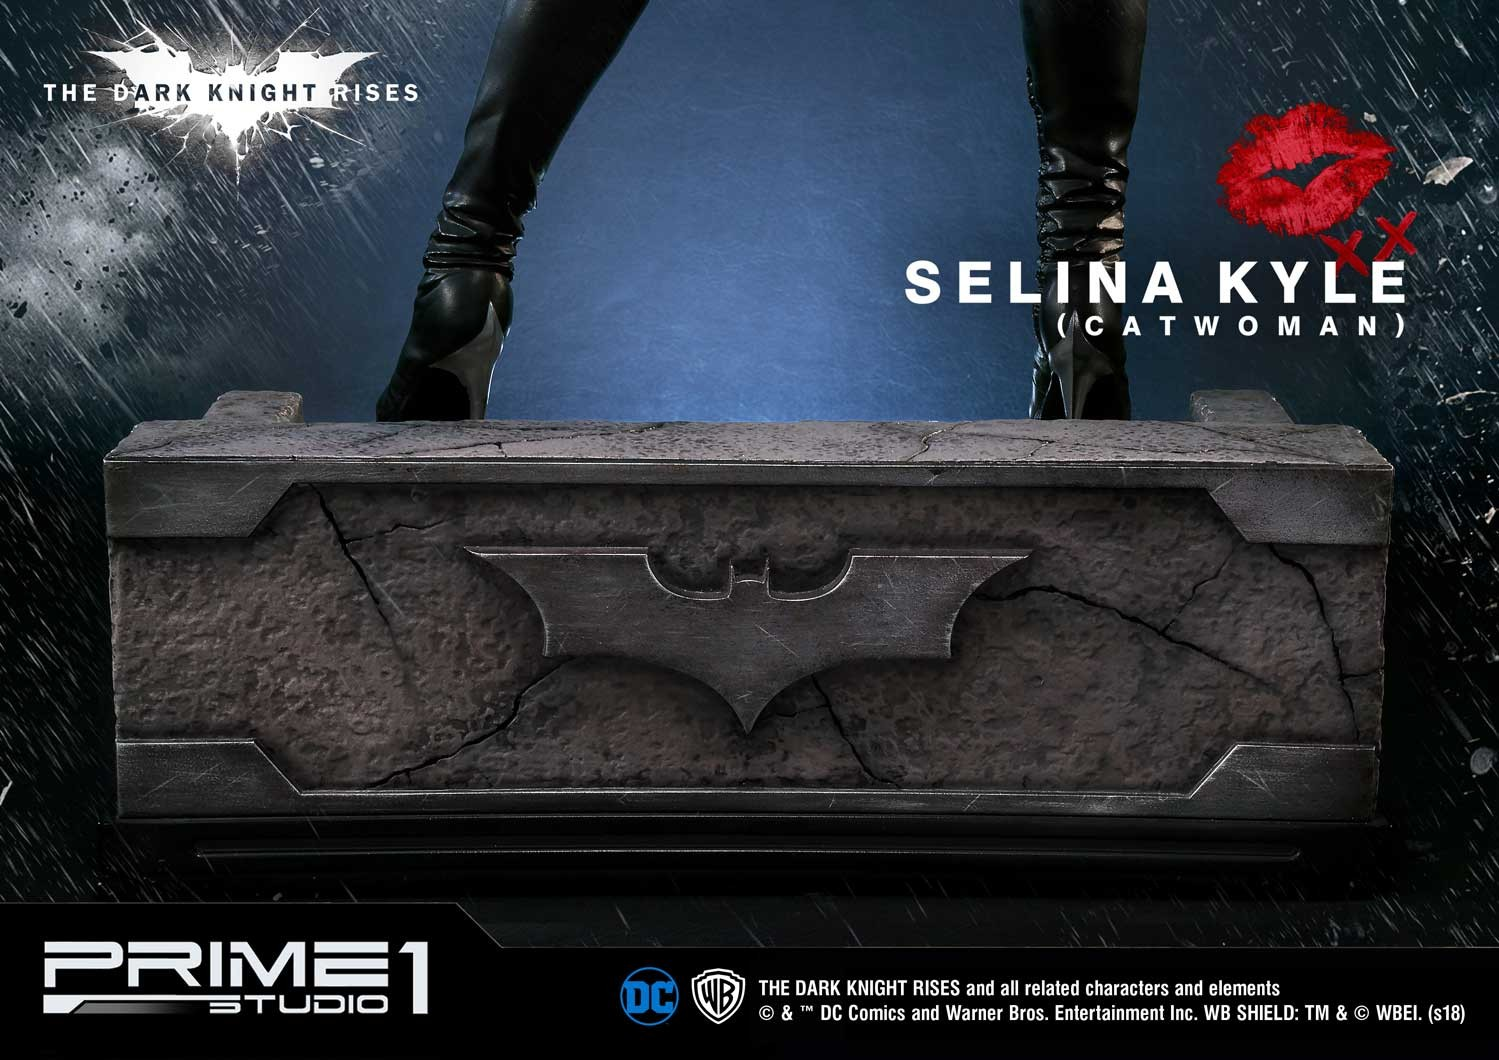 Catwoman (Selina Kyle) : Batman The Dark Knigh Rises (Prime 1 Studio) 1ihBrvxw_o